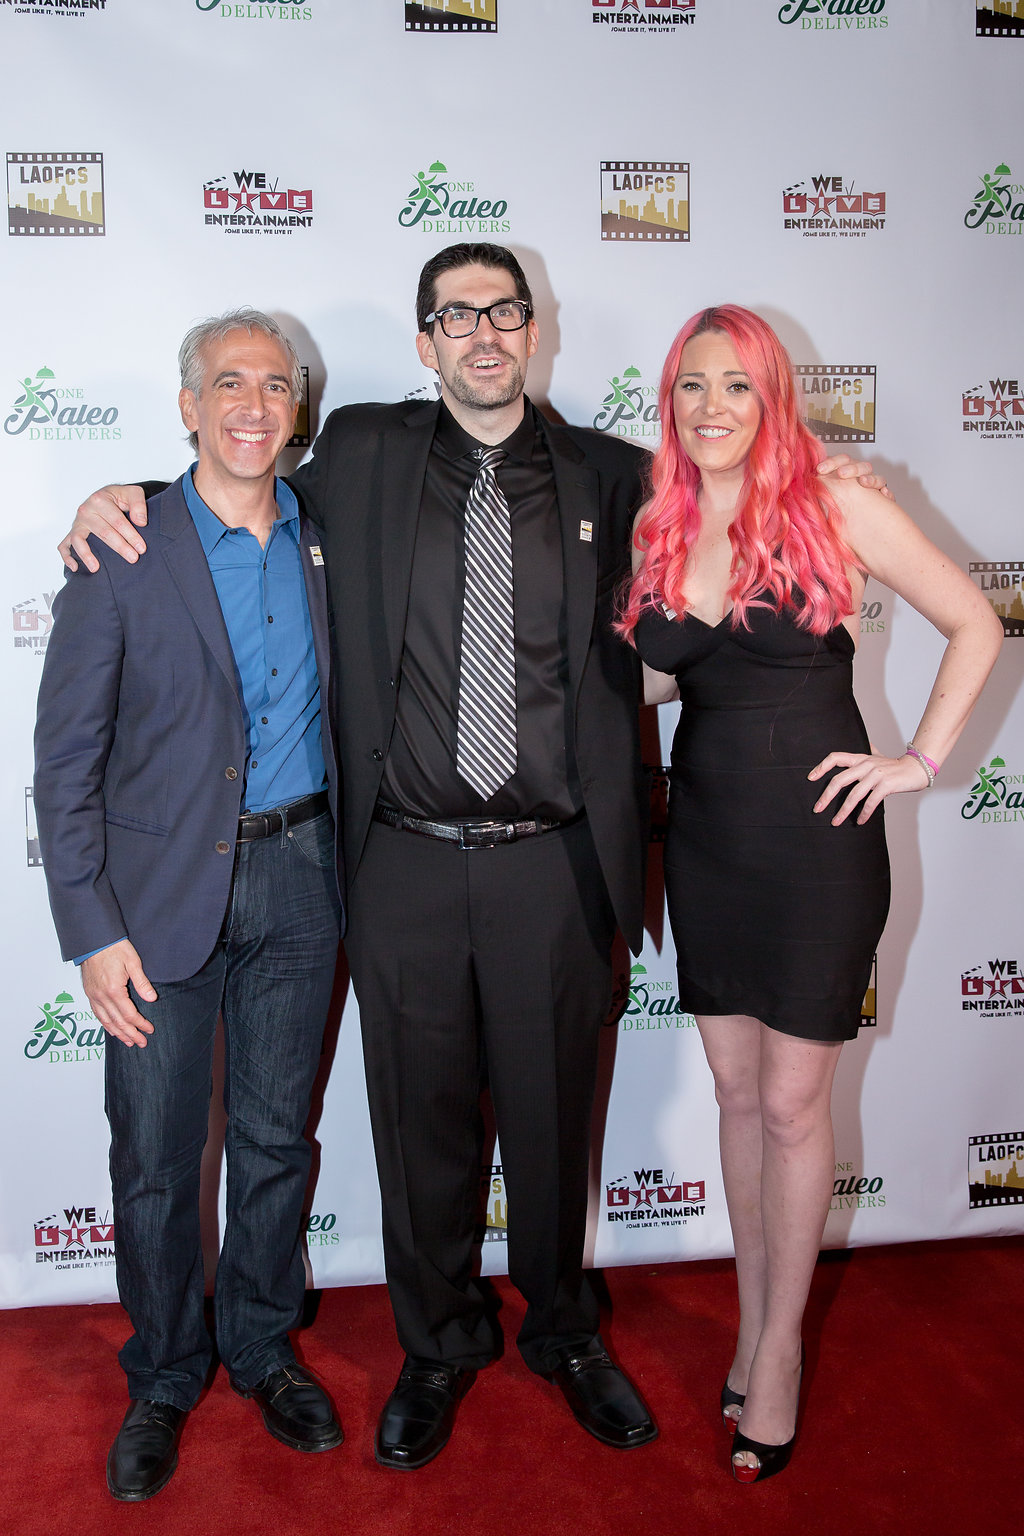 Scott Mantz, Scott Menzel, and Krisily Kennedy